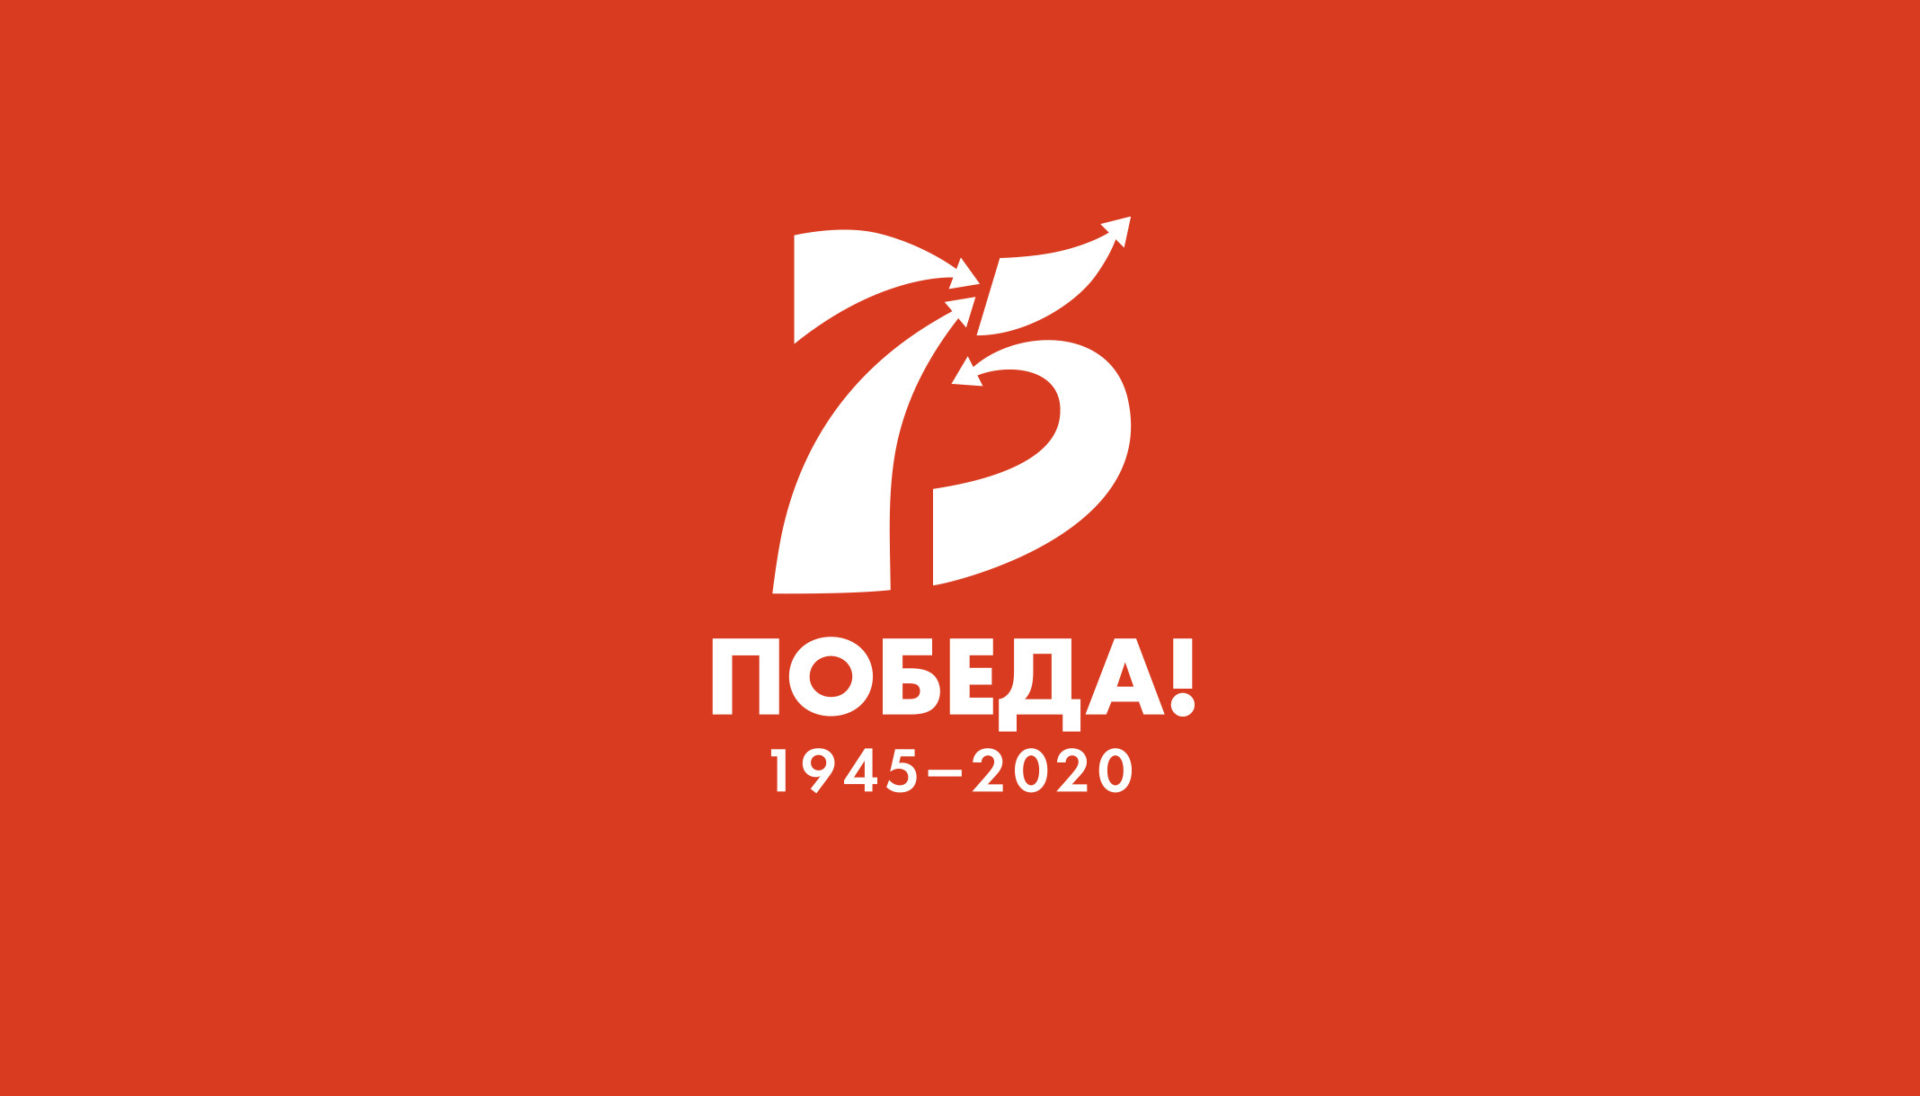 Библиотеки города Якутска представляют онлайн-программу мероприятий ко Дню Победы